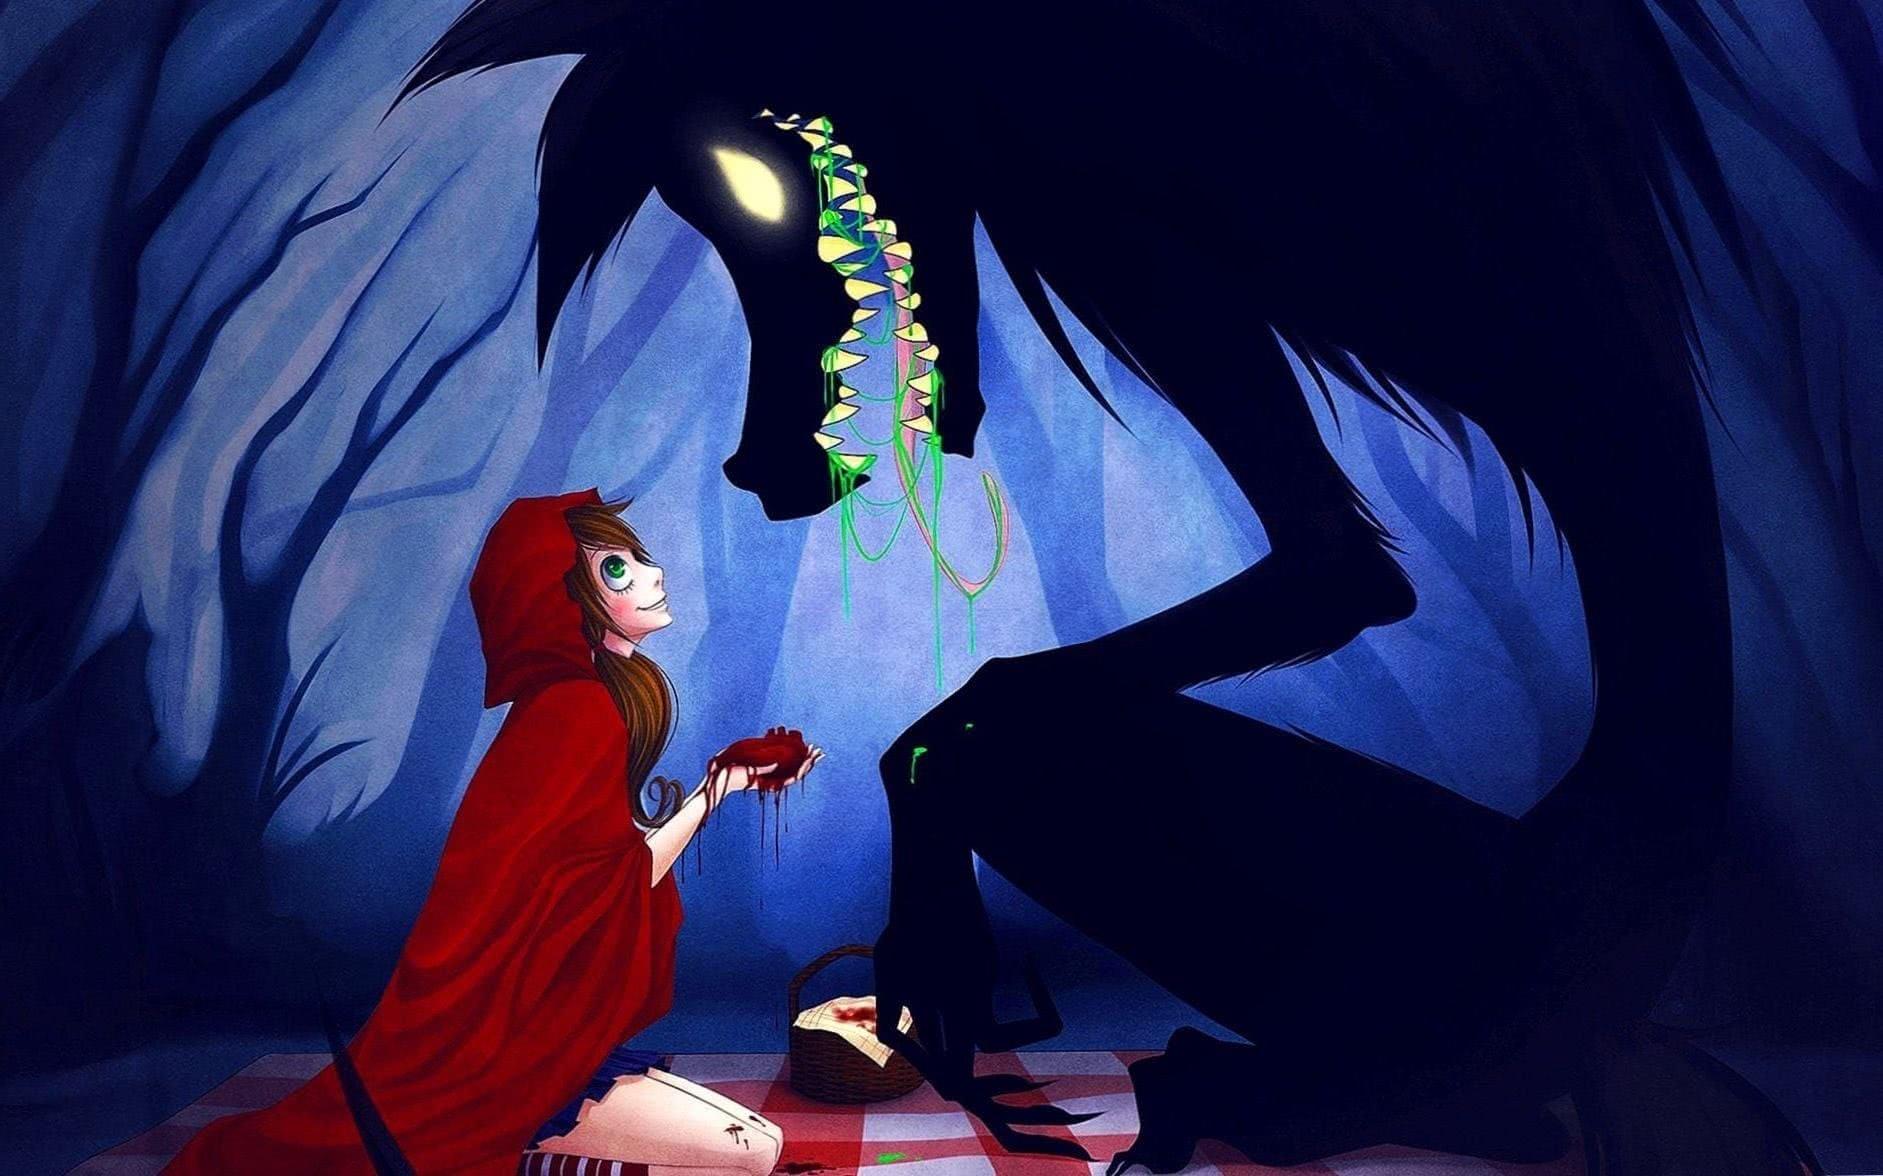 Big Bad Wolf Wallpaper Fairytale